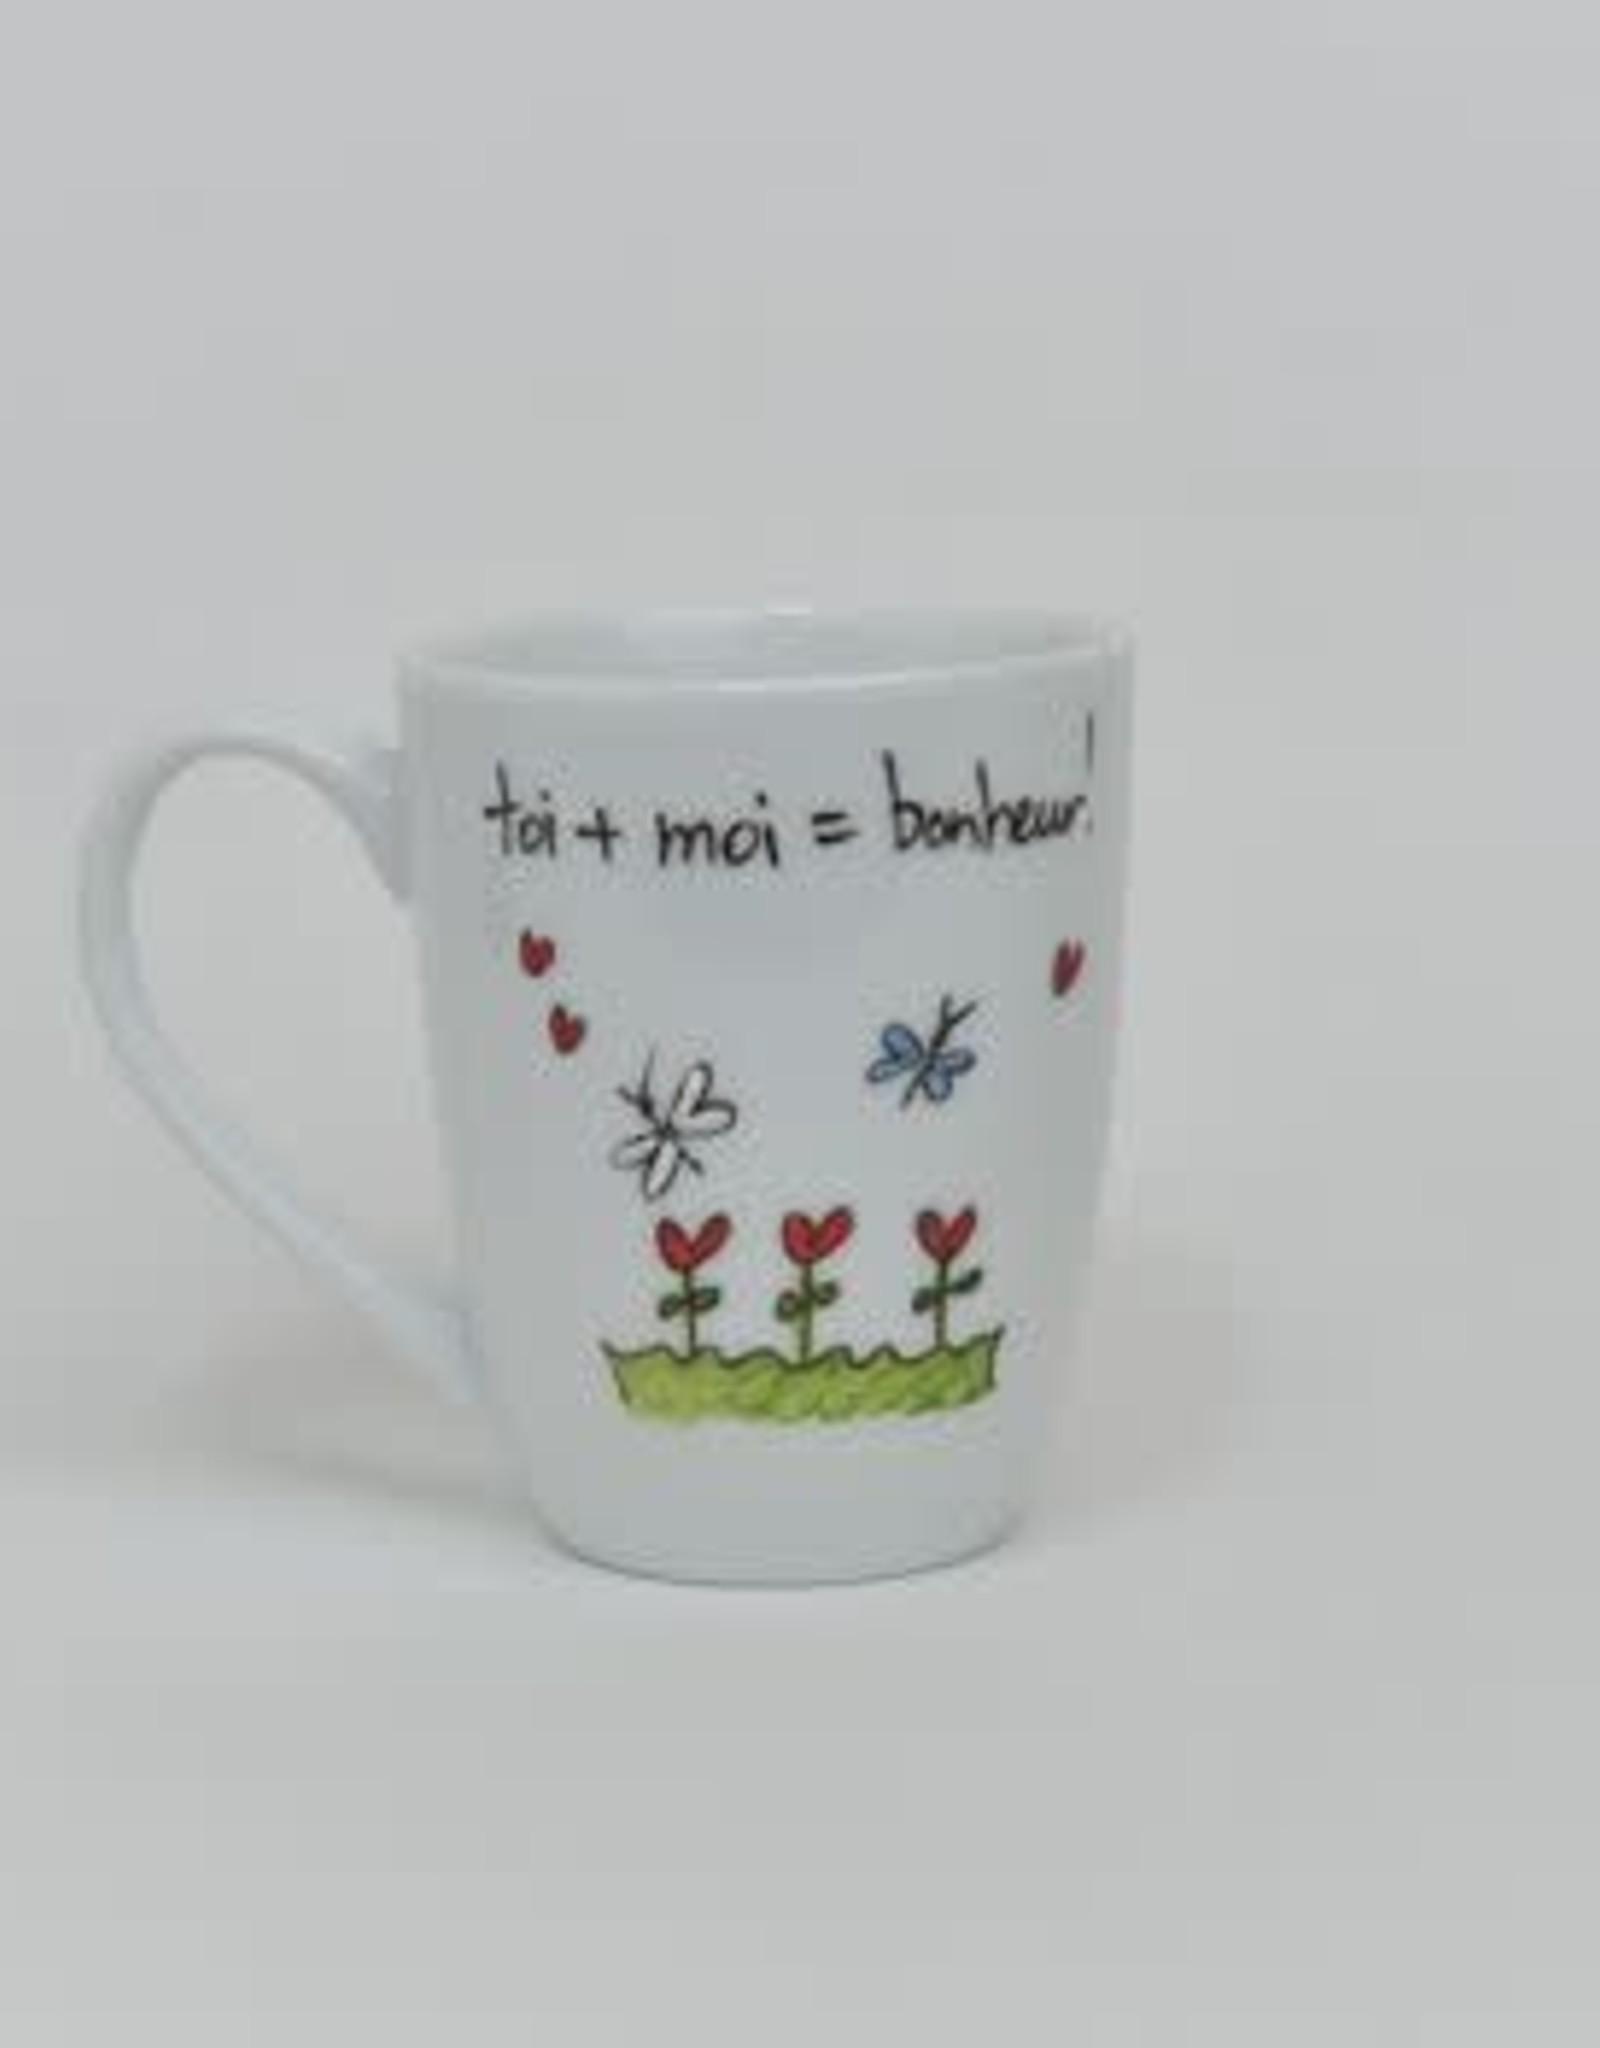 MA GRAND'NOIRE Tasse  Toi + moi = bonheur!